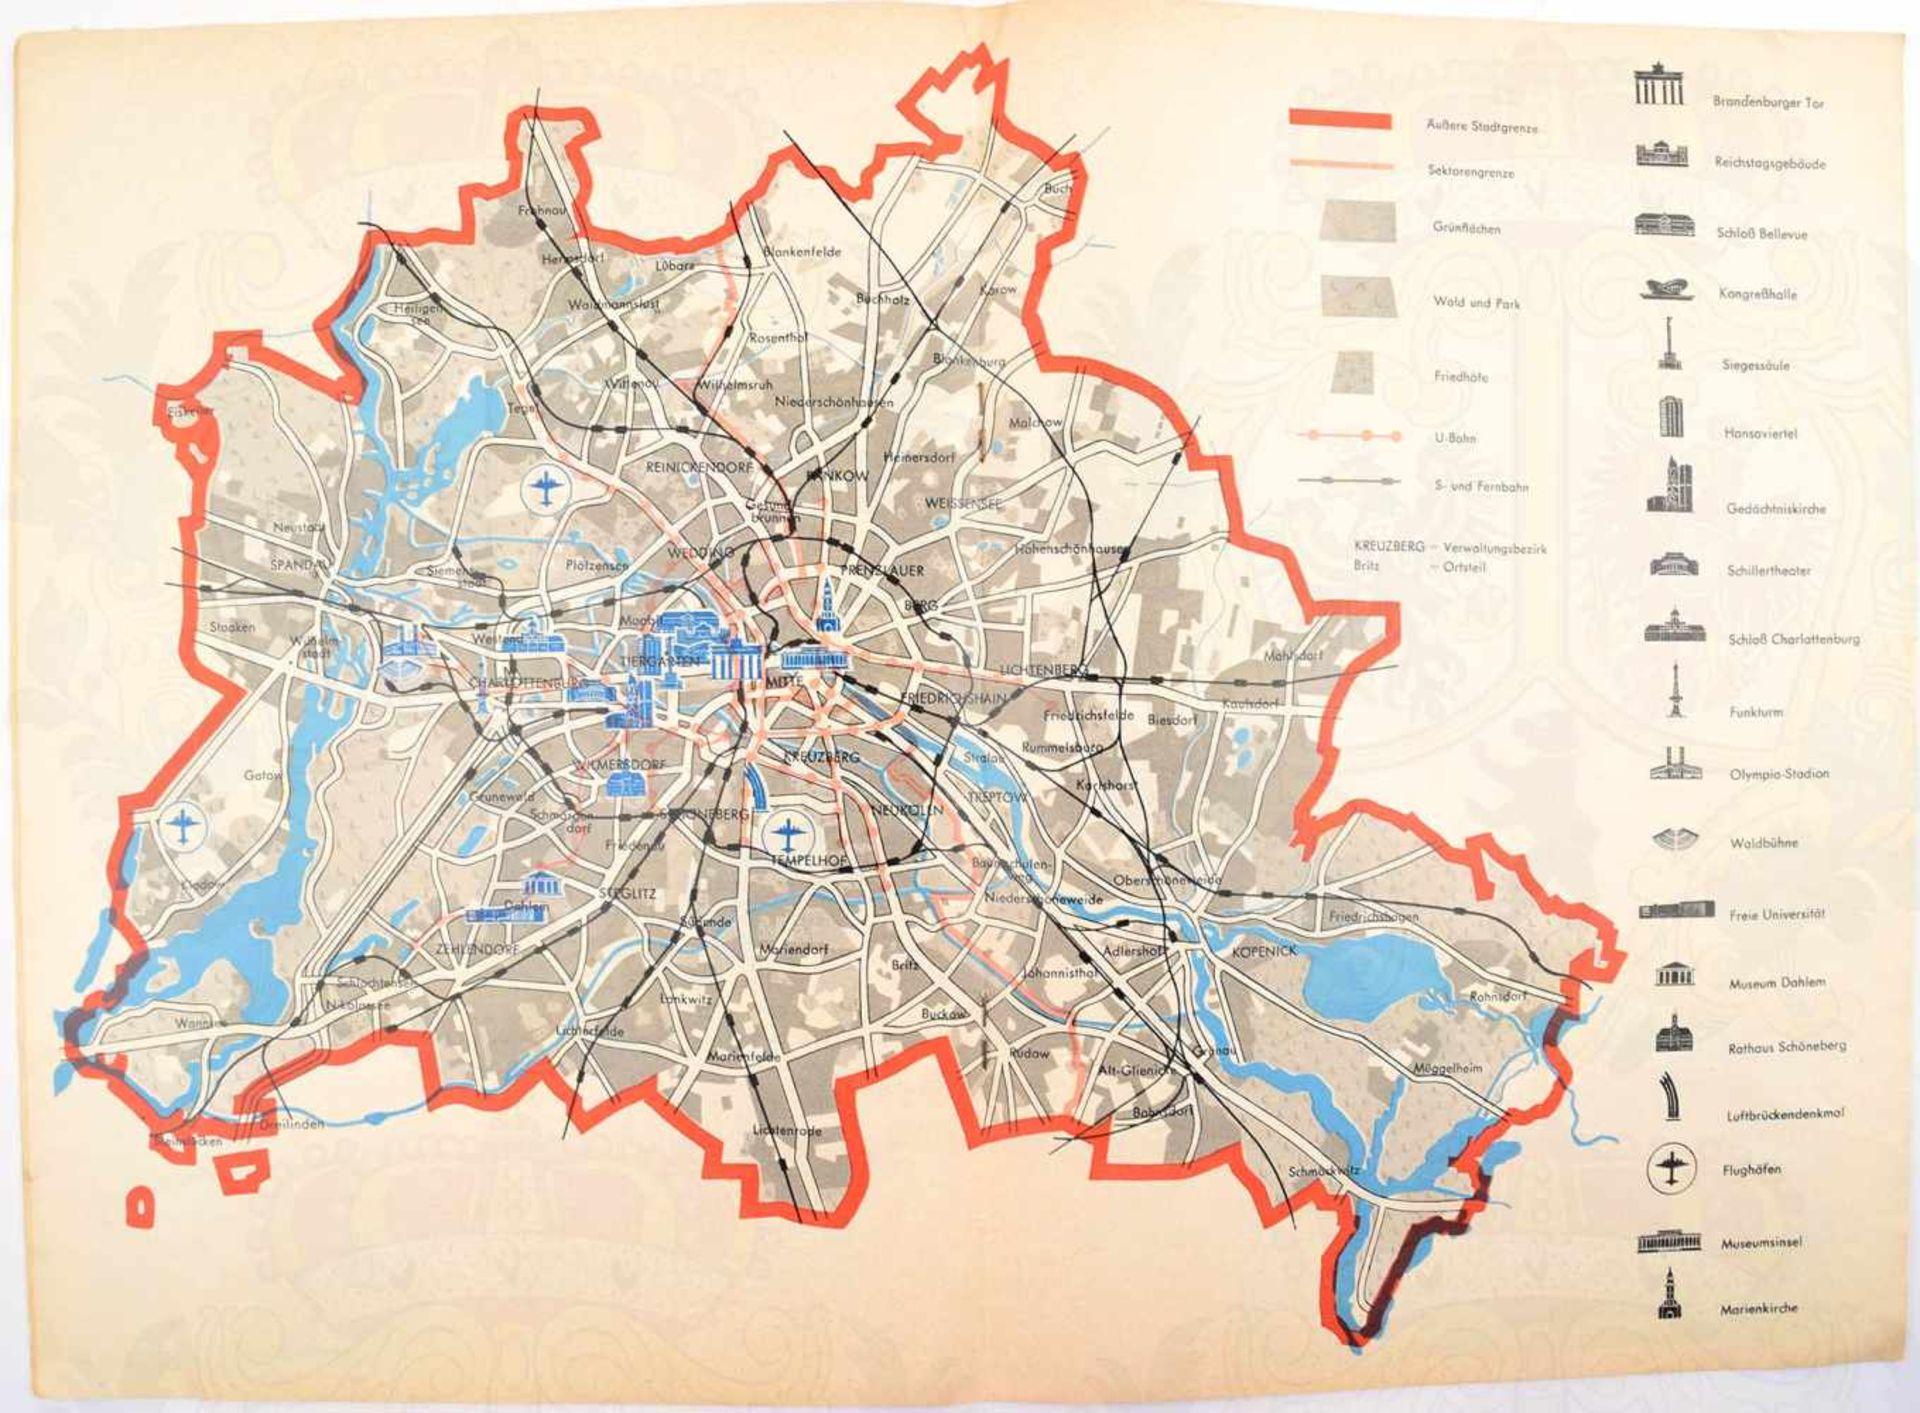 "Los 44 - 5 TEILE BERLIN: Broschüre ""Berlin als Vergnügungsstadt"", 1911, 56 S., gr. A4; 2 Stadtpläne, 1953;"